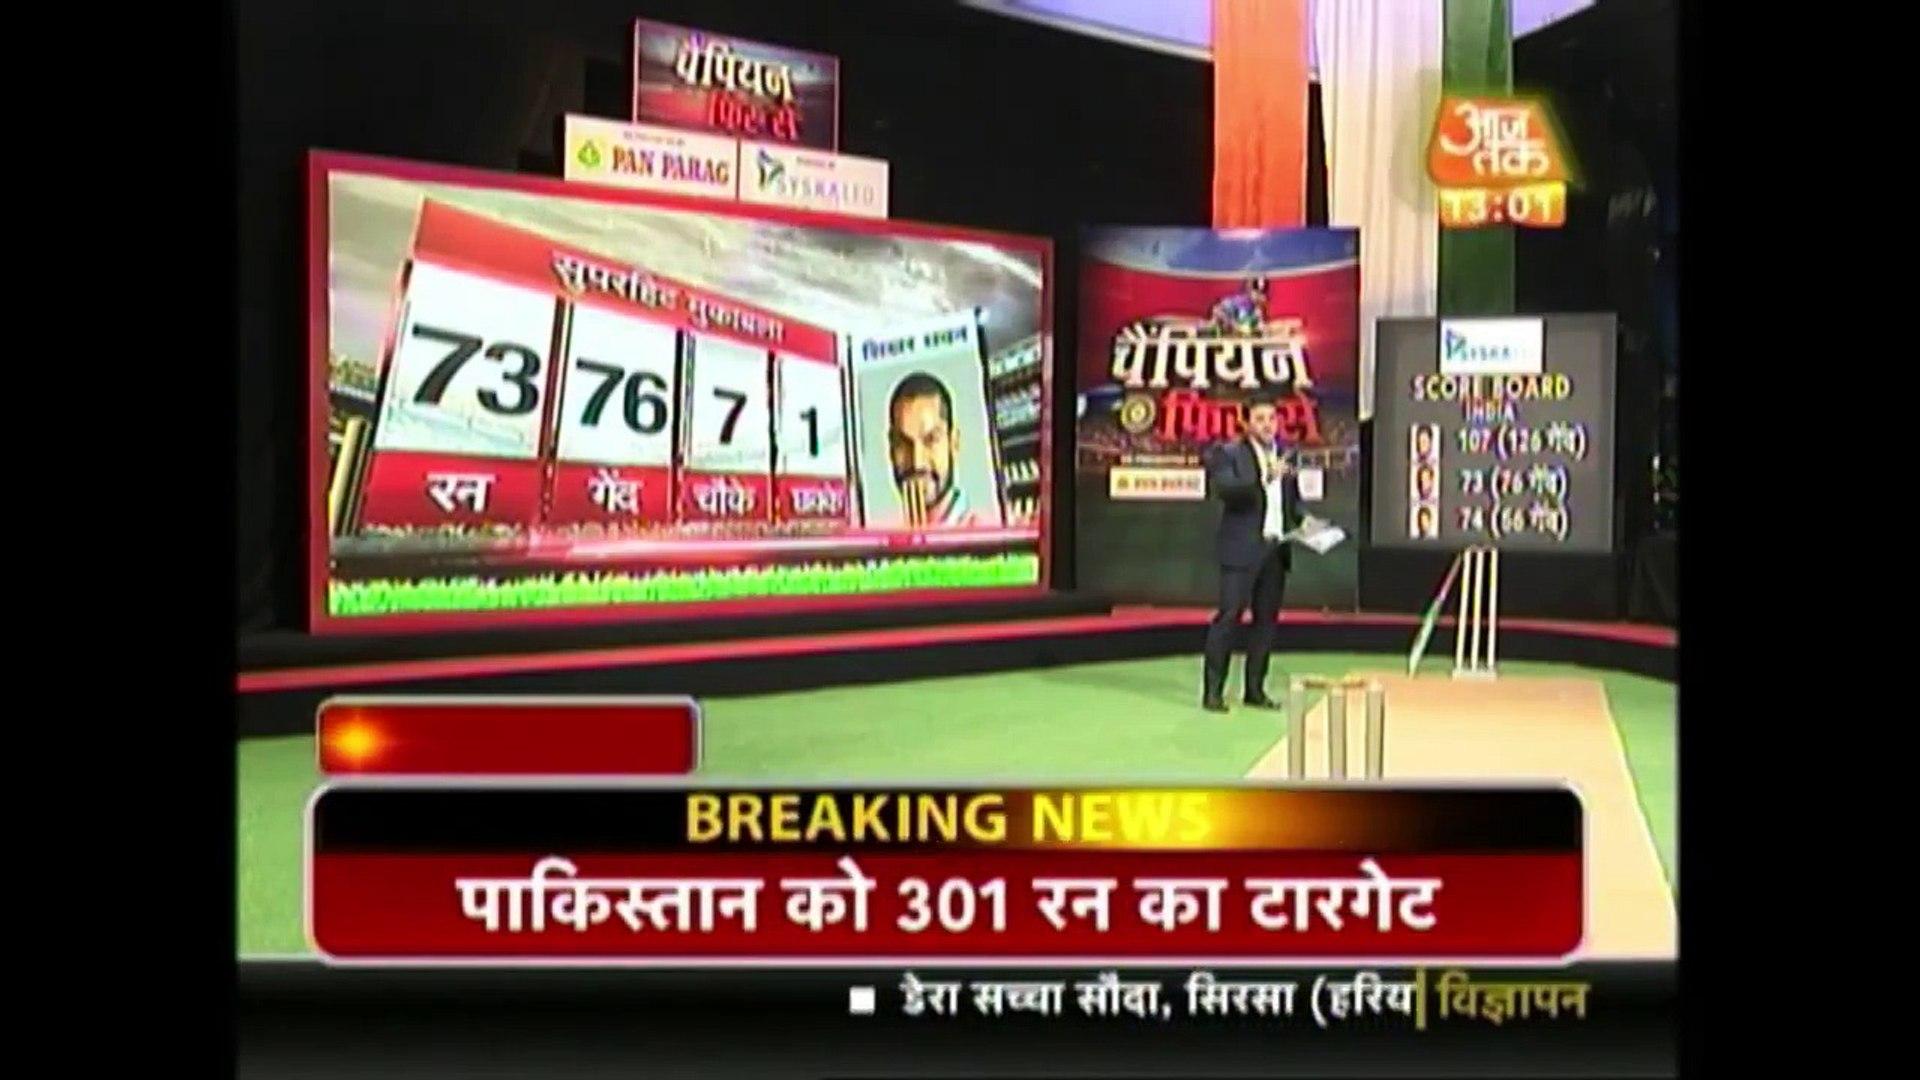 Pakistan Vs India Cricket News